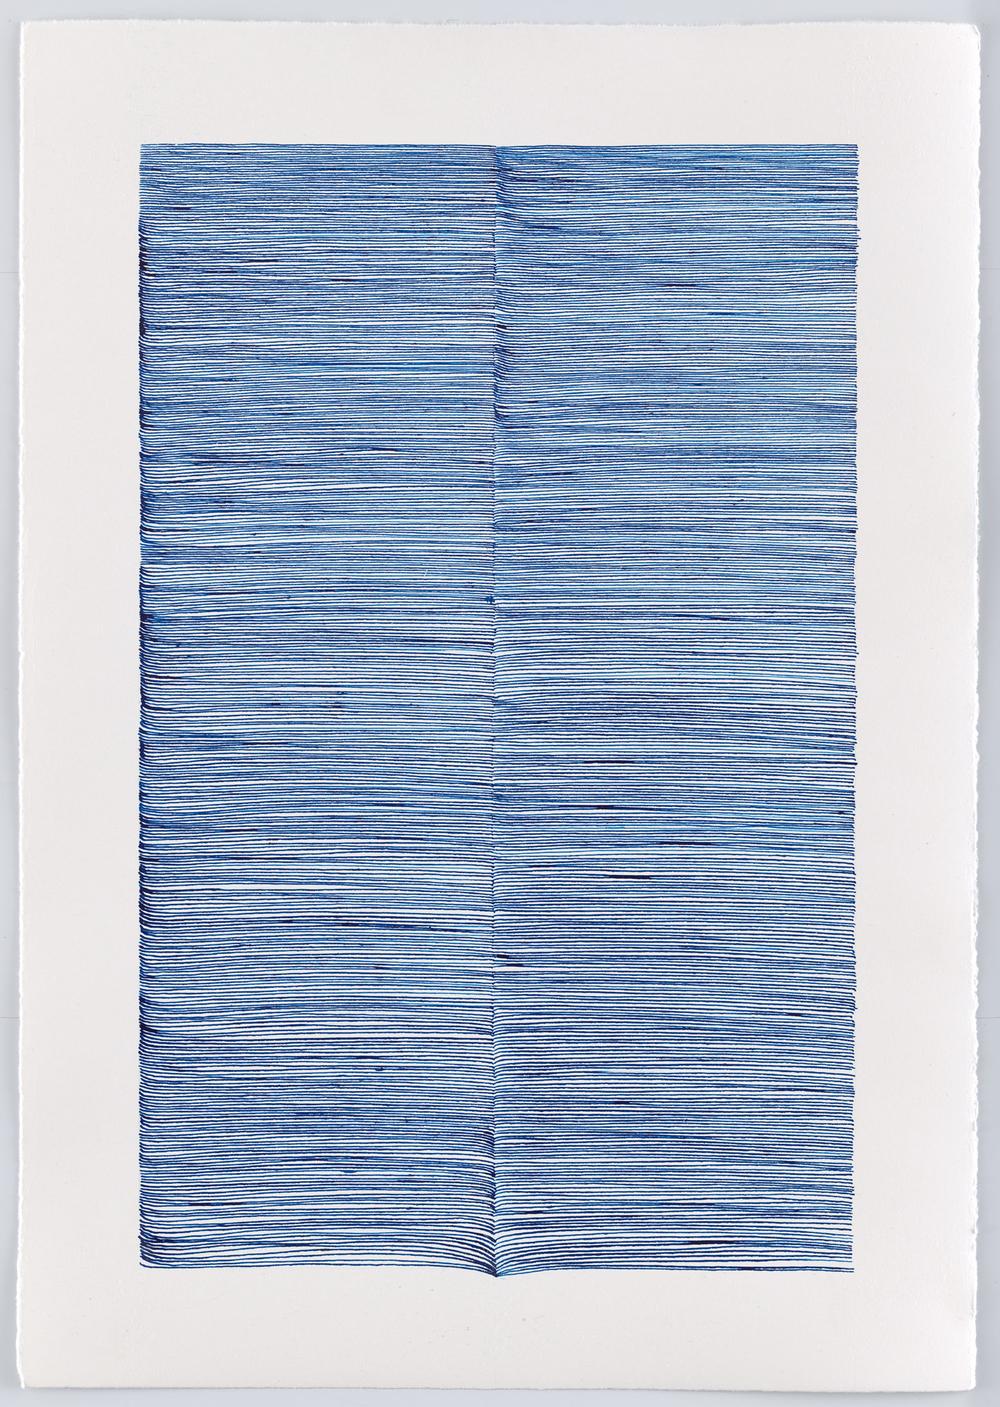 BK P13006 | untitled | blue ink on paper | 42x29cm | 2016